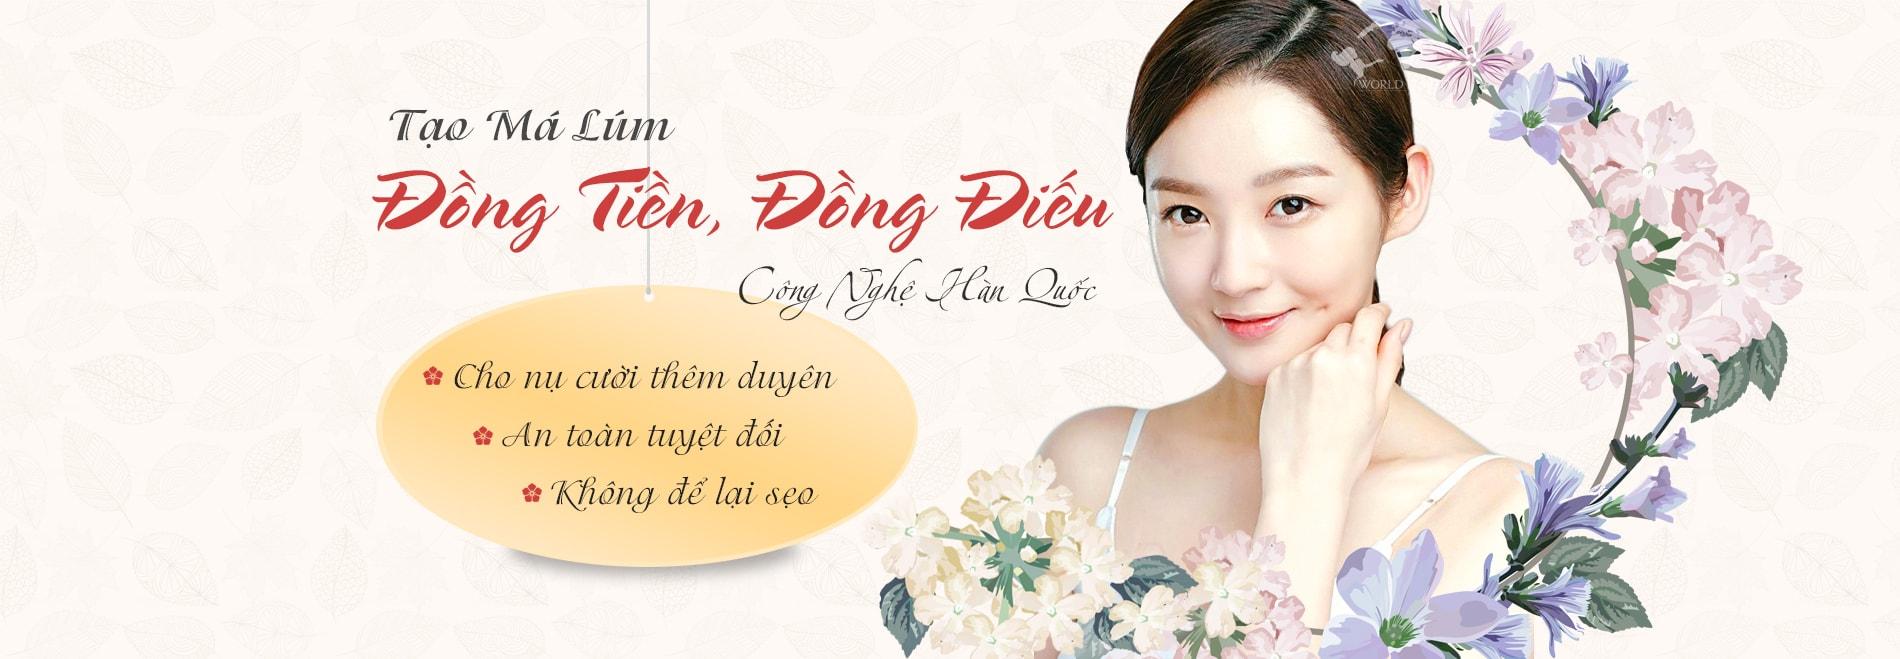 Tao-ma-lum-dong-tien-TheGioiDep-min